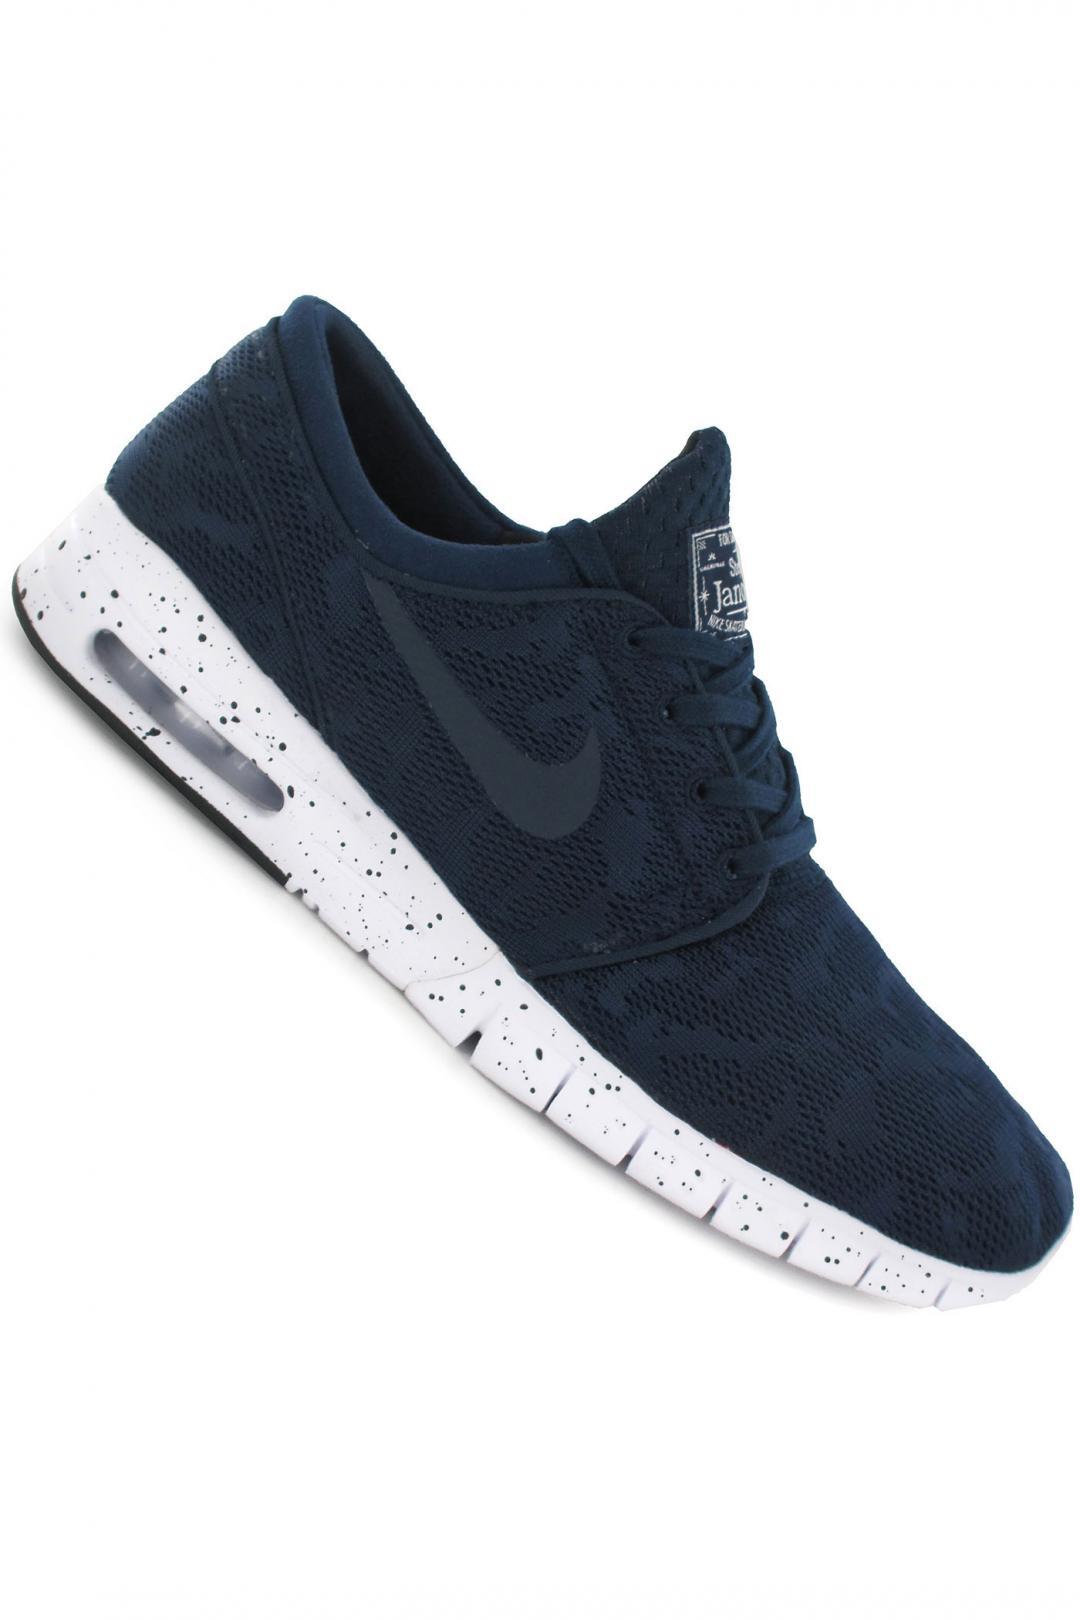 Uomo/Donna Nike SB Stefan Janoski Max midnight navy white | Sneakers low top